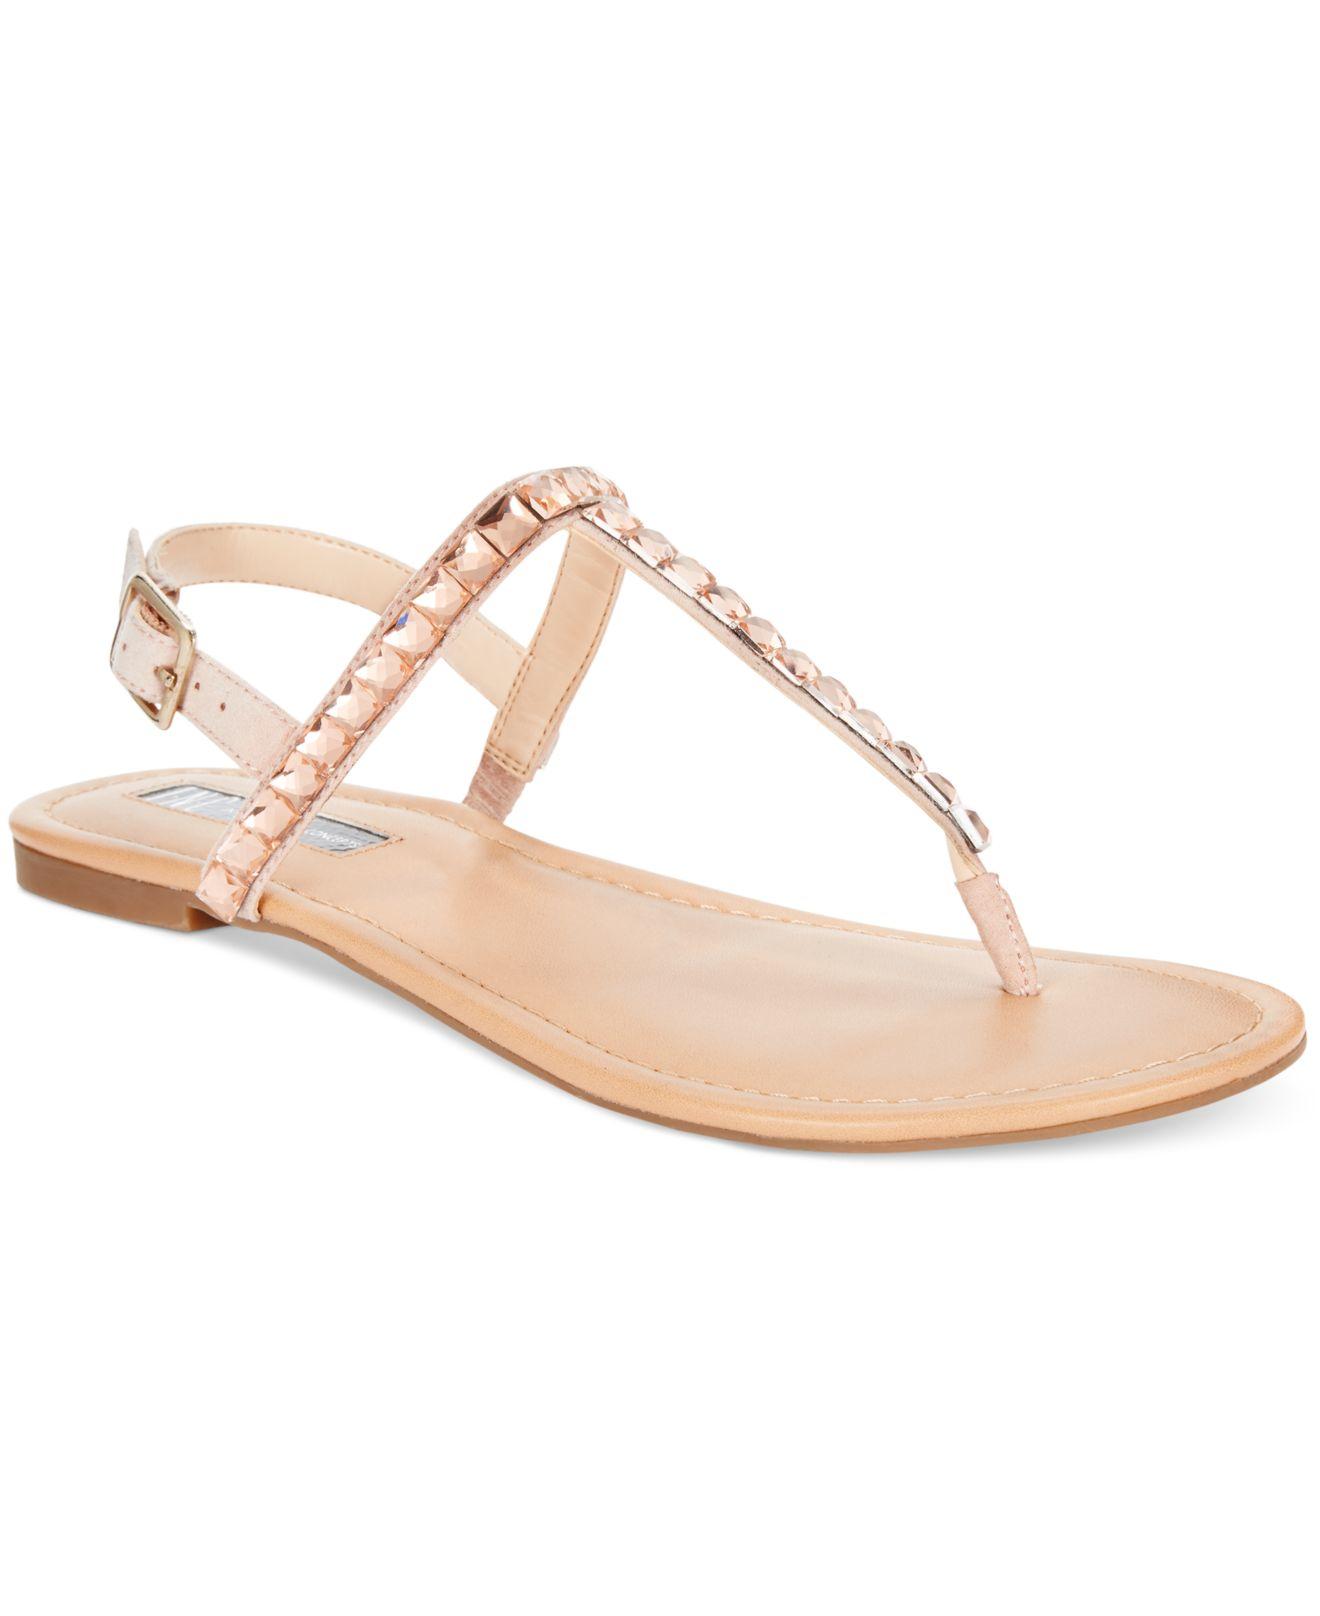 Inc International Concepts Shoes Uk